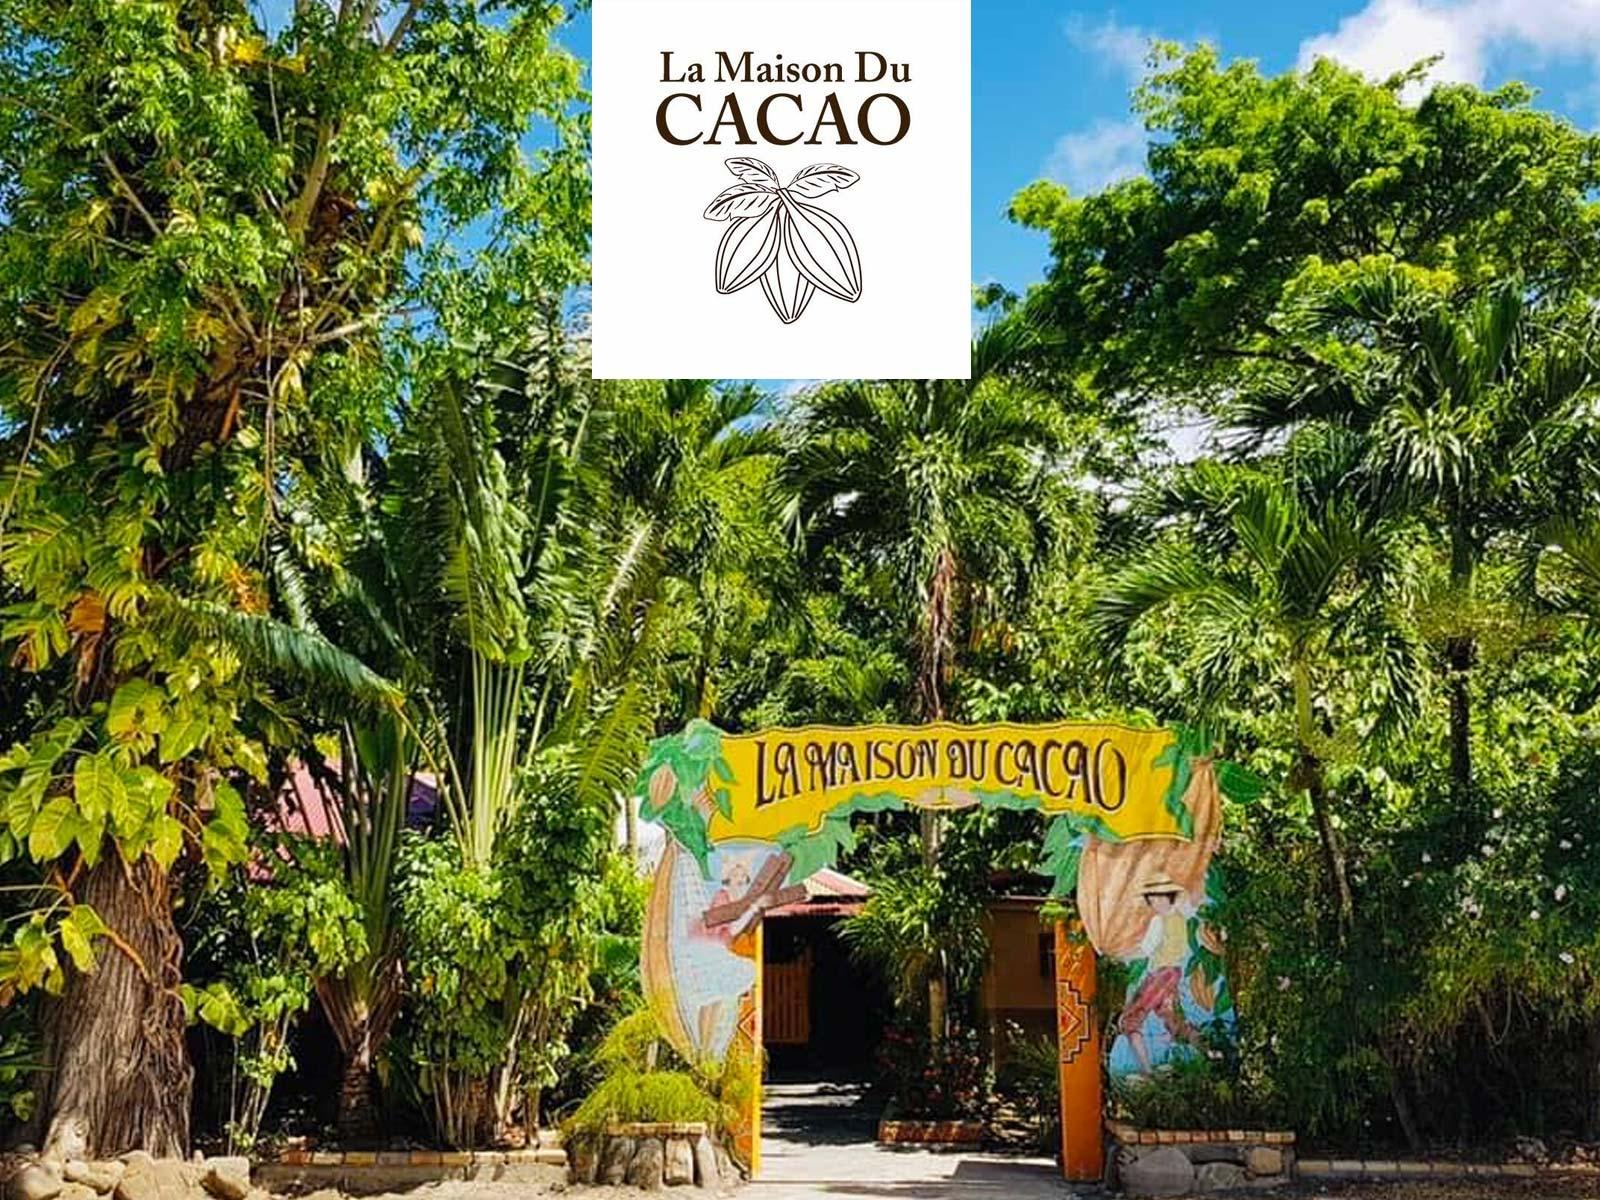 Maison du cacao